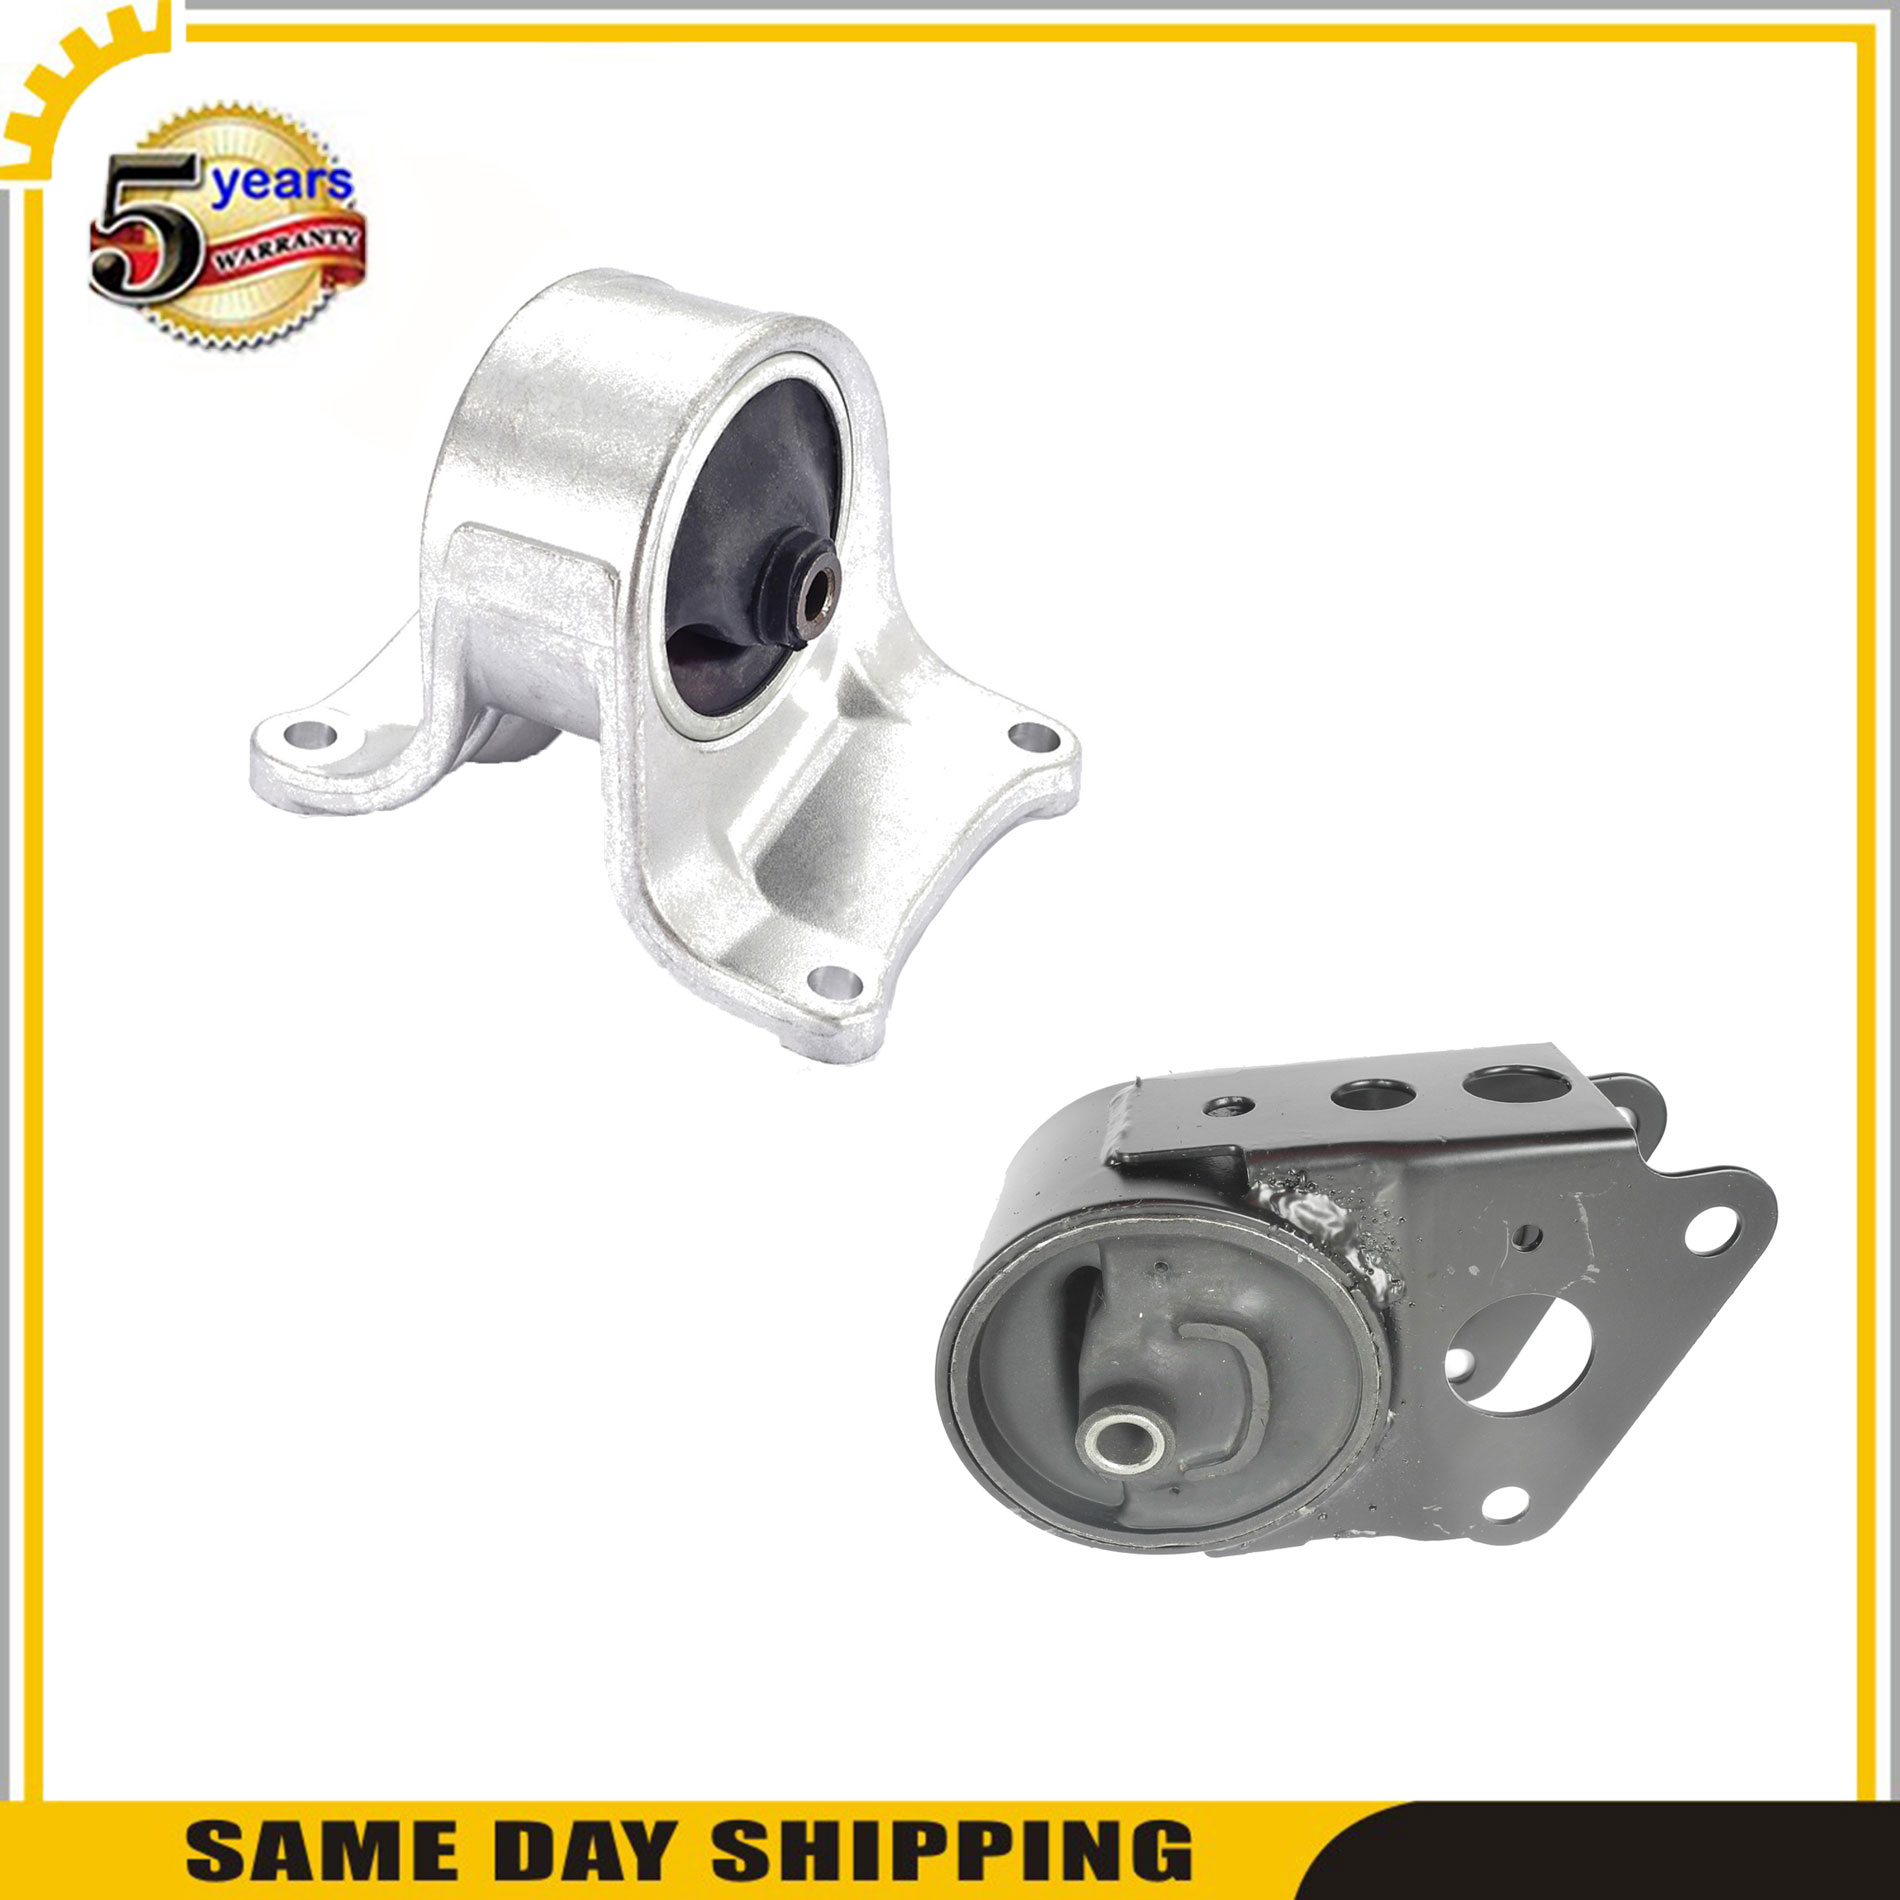 3PCS Engine Motor /& Transmission Mount For Nissan Altima SL Sedan FWD M3249